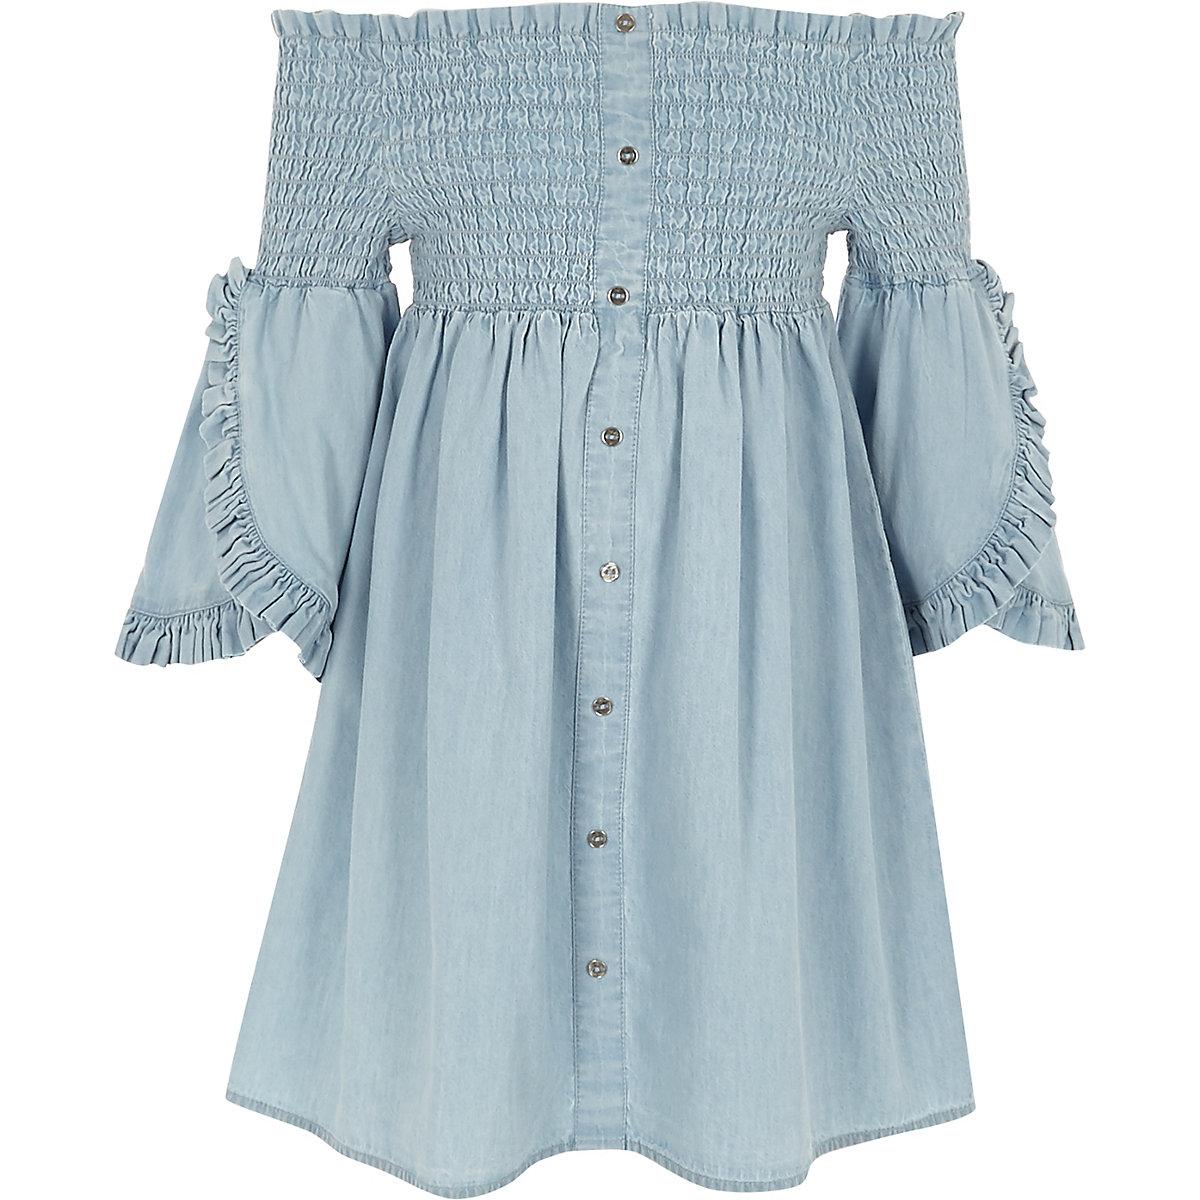 Robe Bardot en denim bleue froncée pour fille